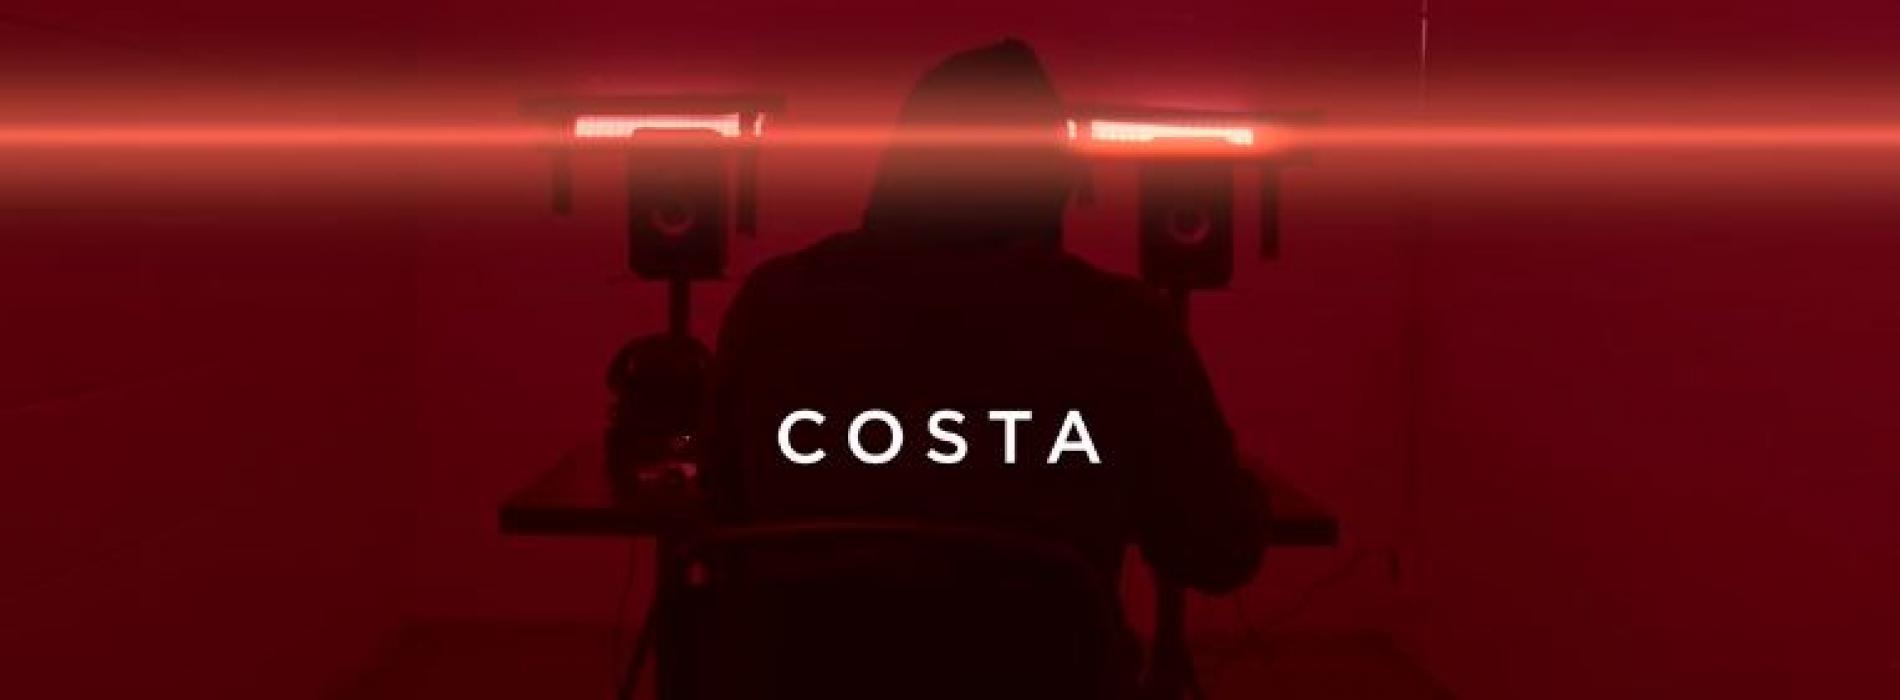 Costa – මල් පැණි රොන Mal Pani Rona (Official Music Video)